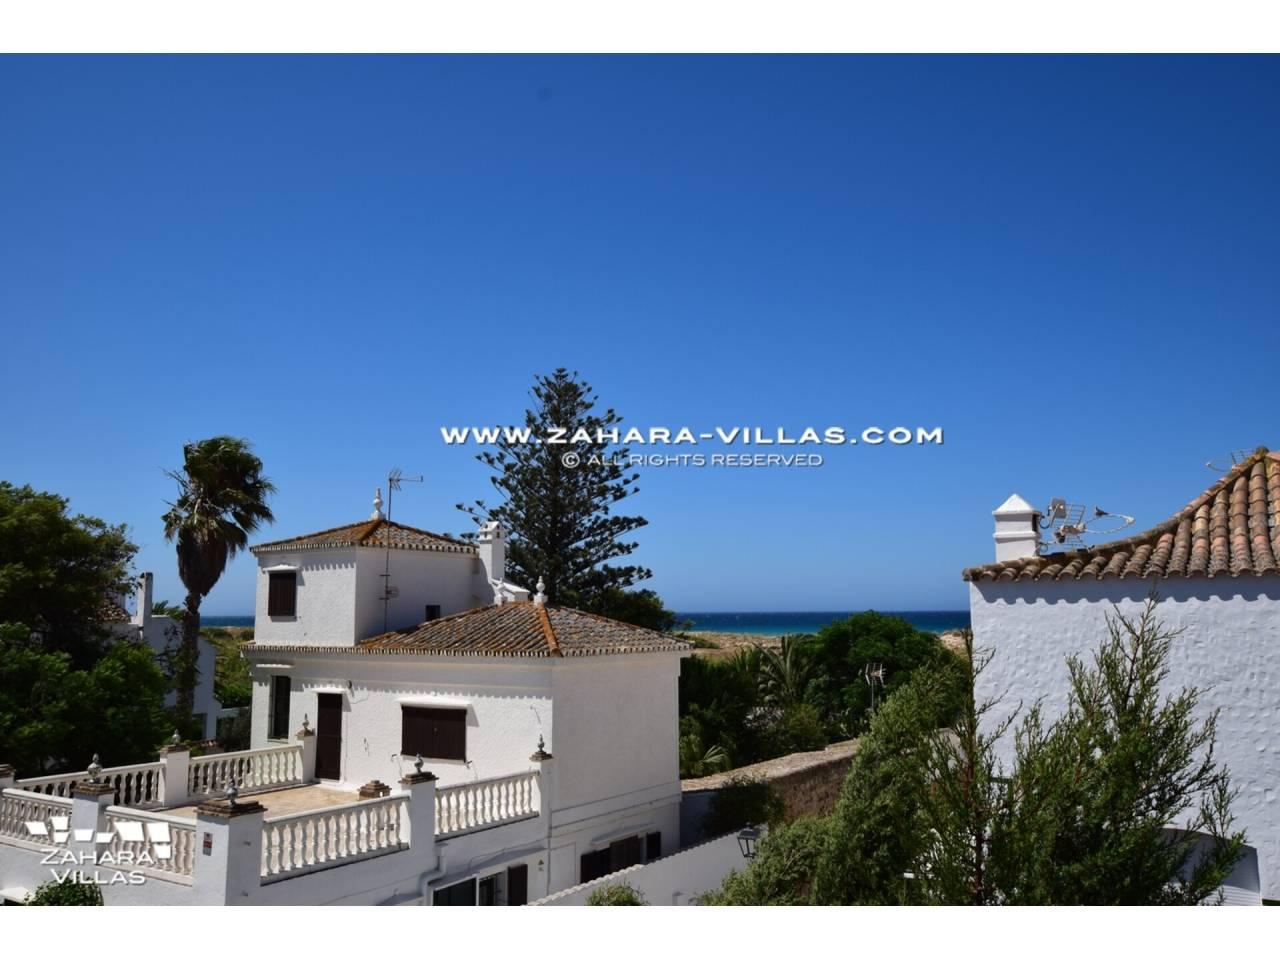 Imagen 1 de House for sale close to the beach, with sea views in Zahara de los Atunes